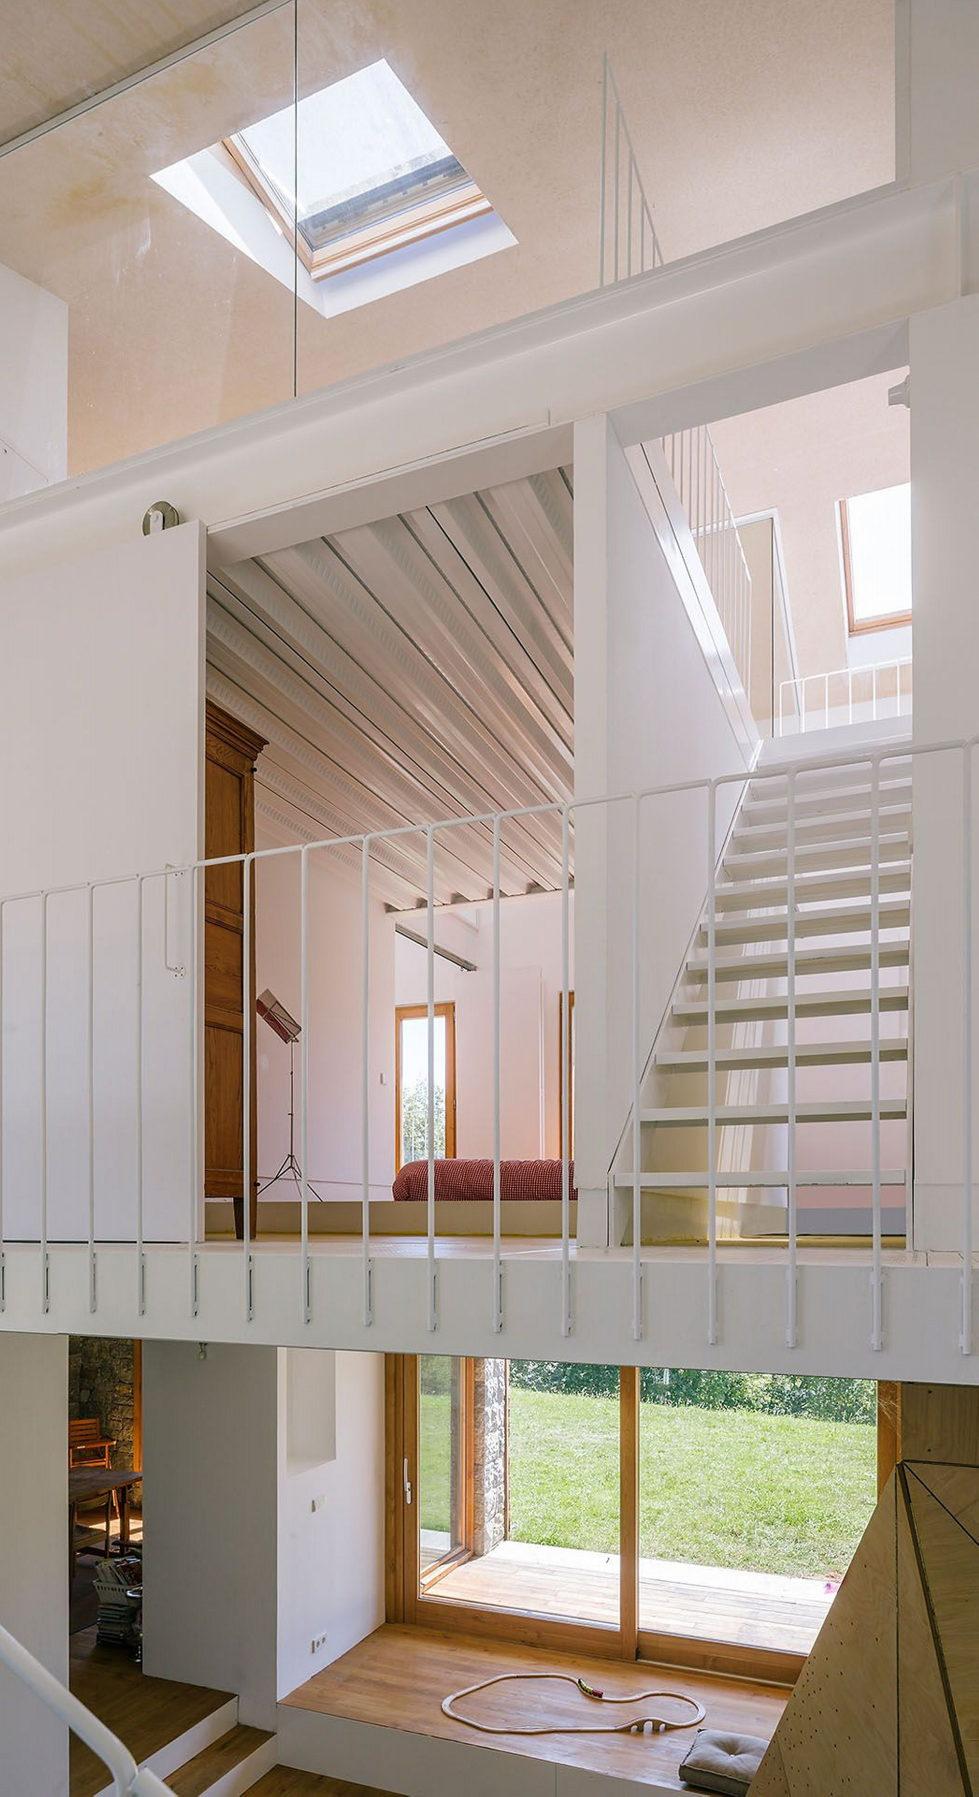 Casa Tmolo A Small Residency In Spain From PYO Arquitectos 14